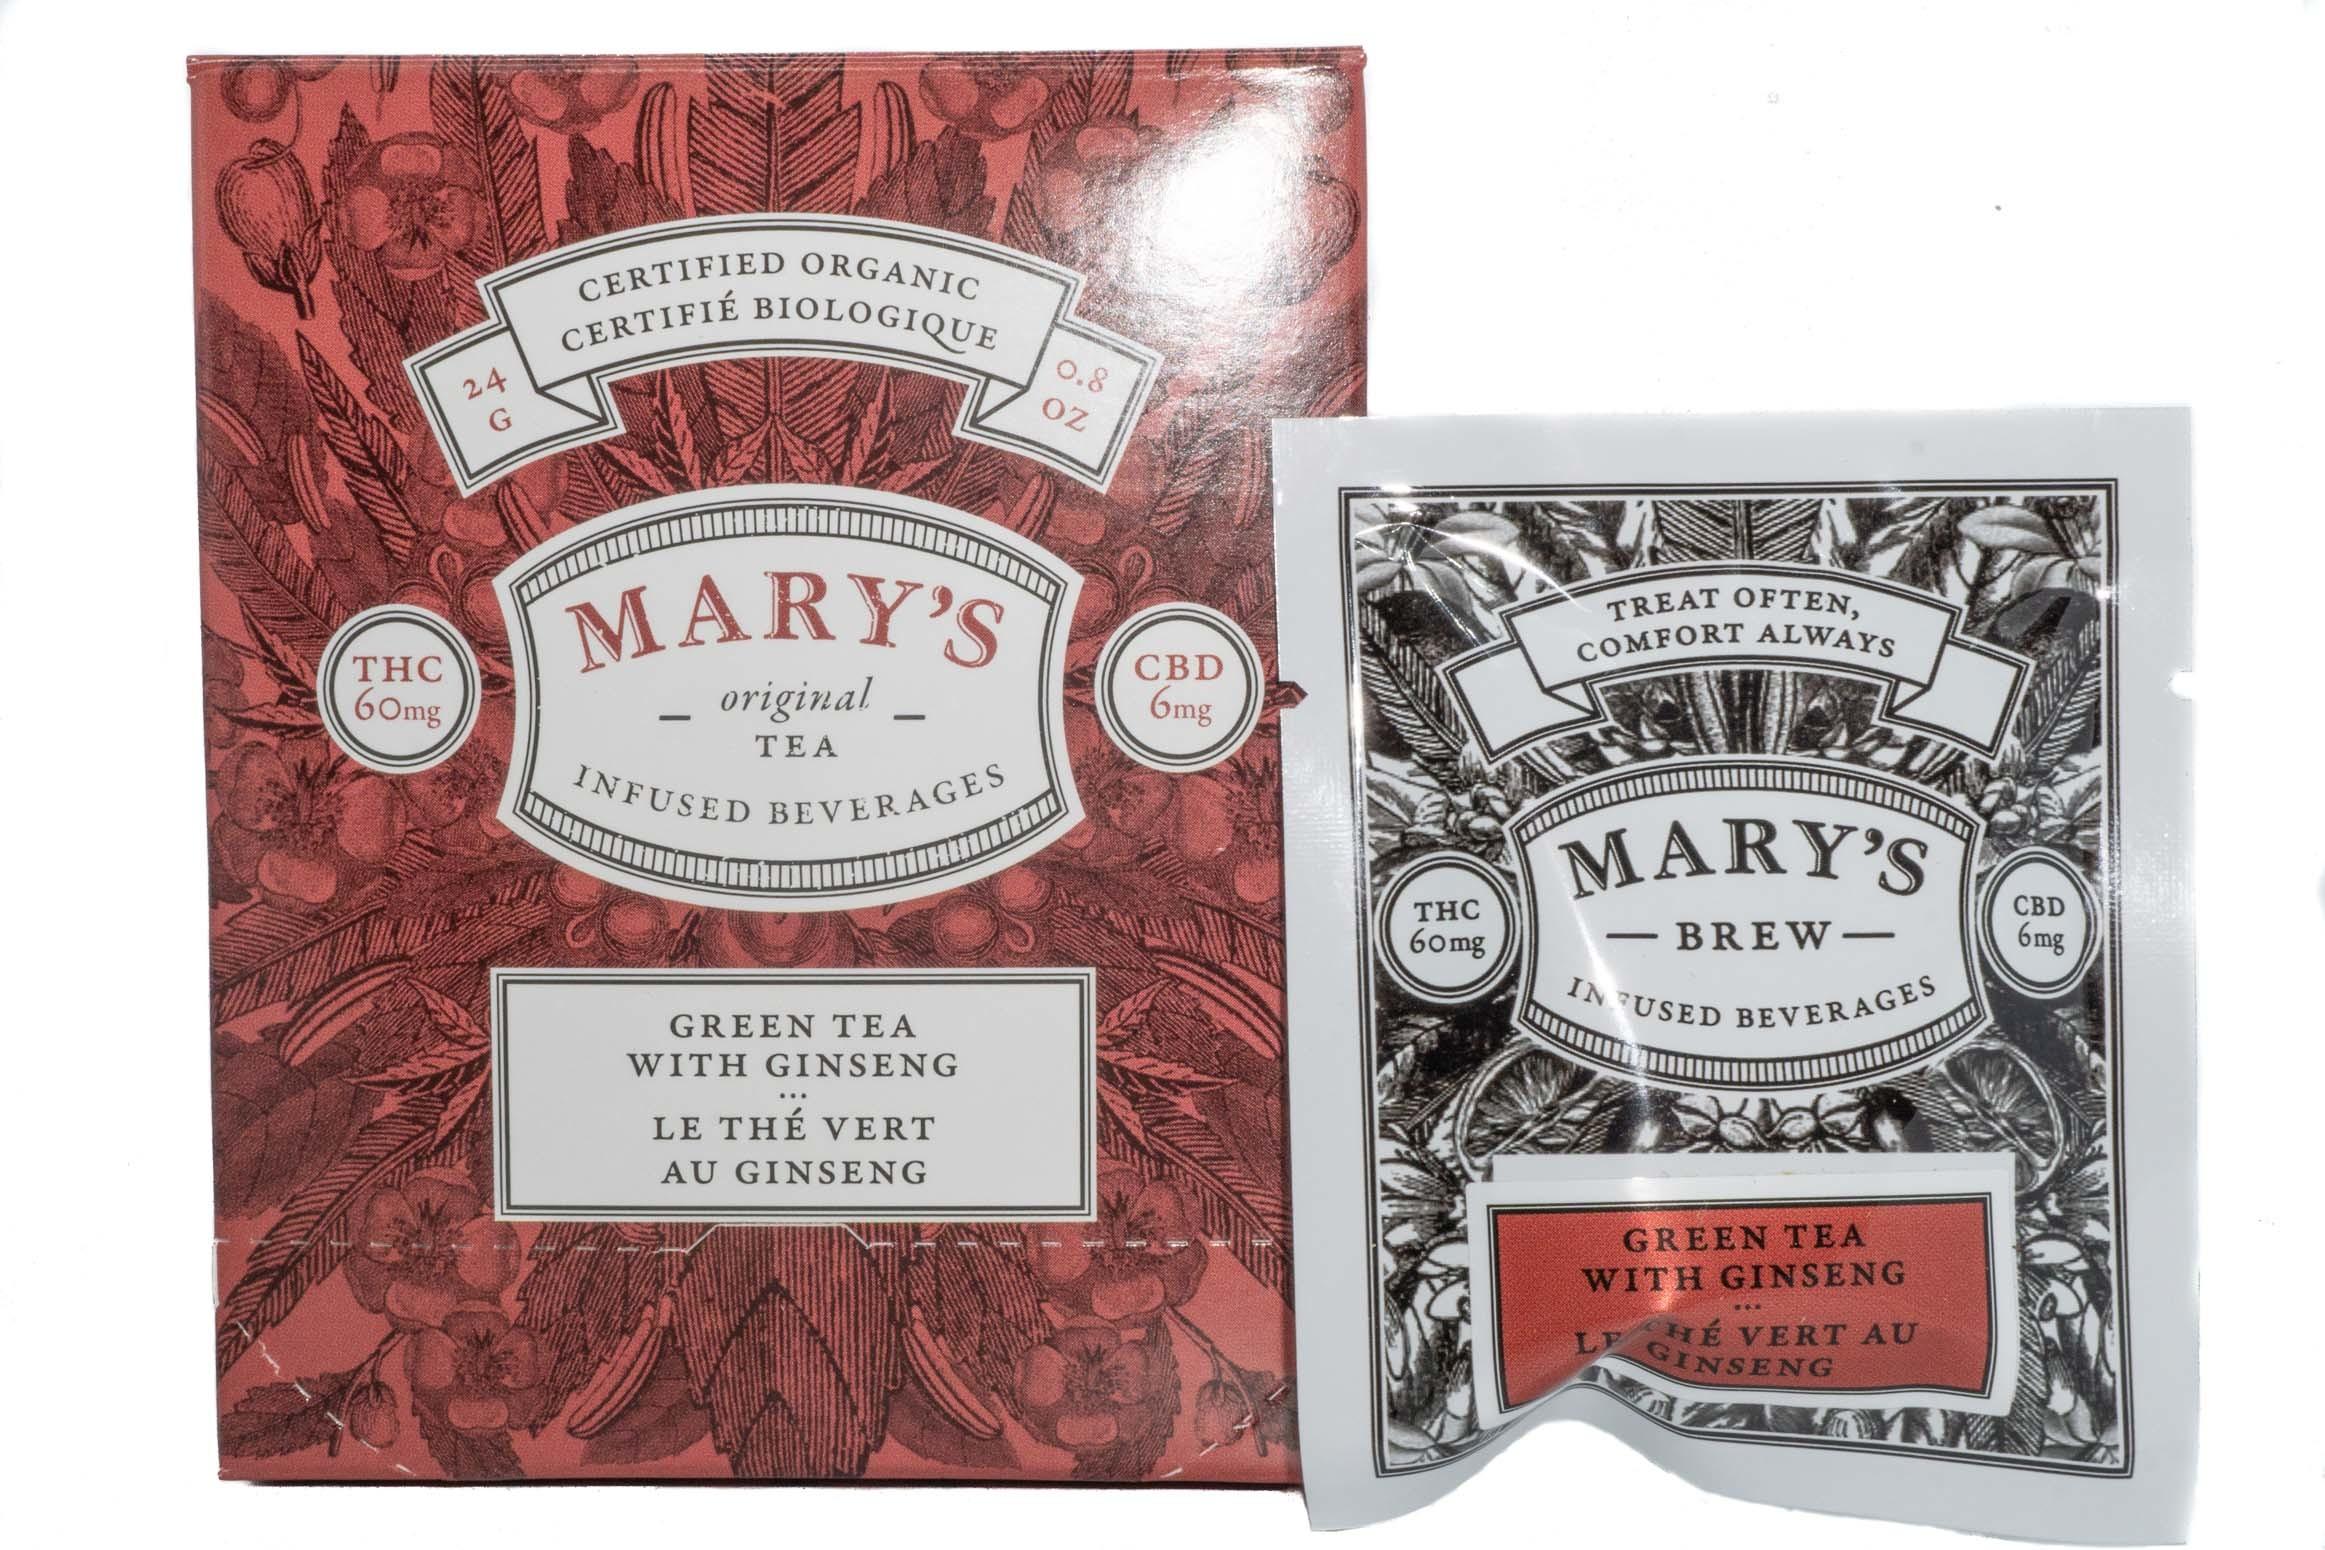 Mary's Wellness Green Tea With Ginseng (Single Sachet) (60mg THC/6mg CBD) 01240